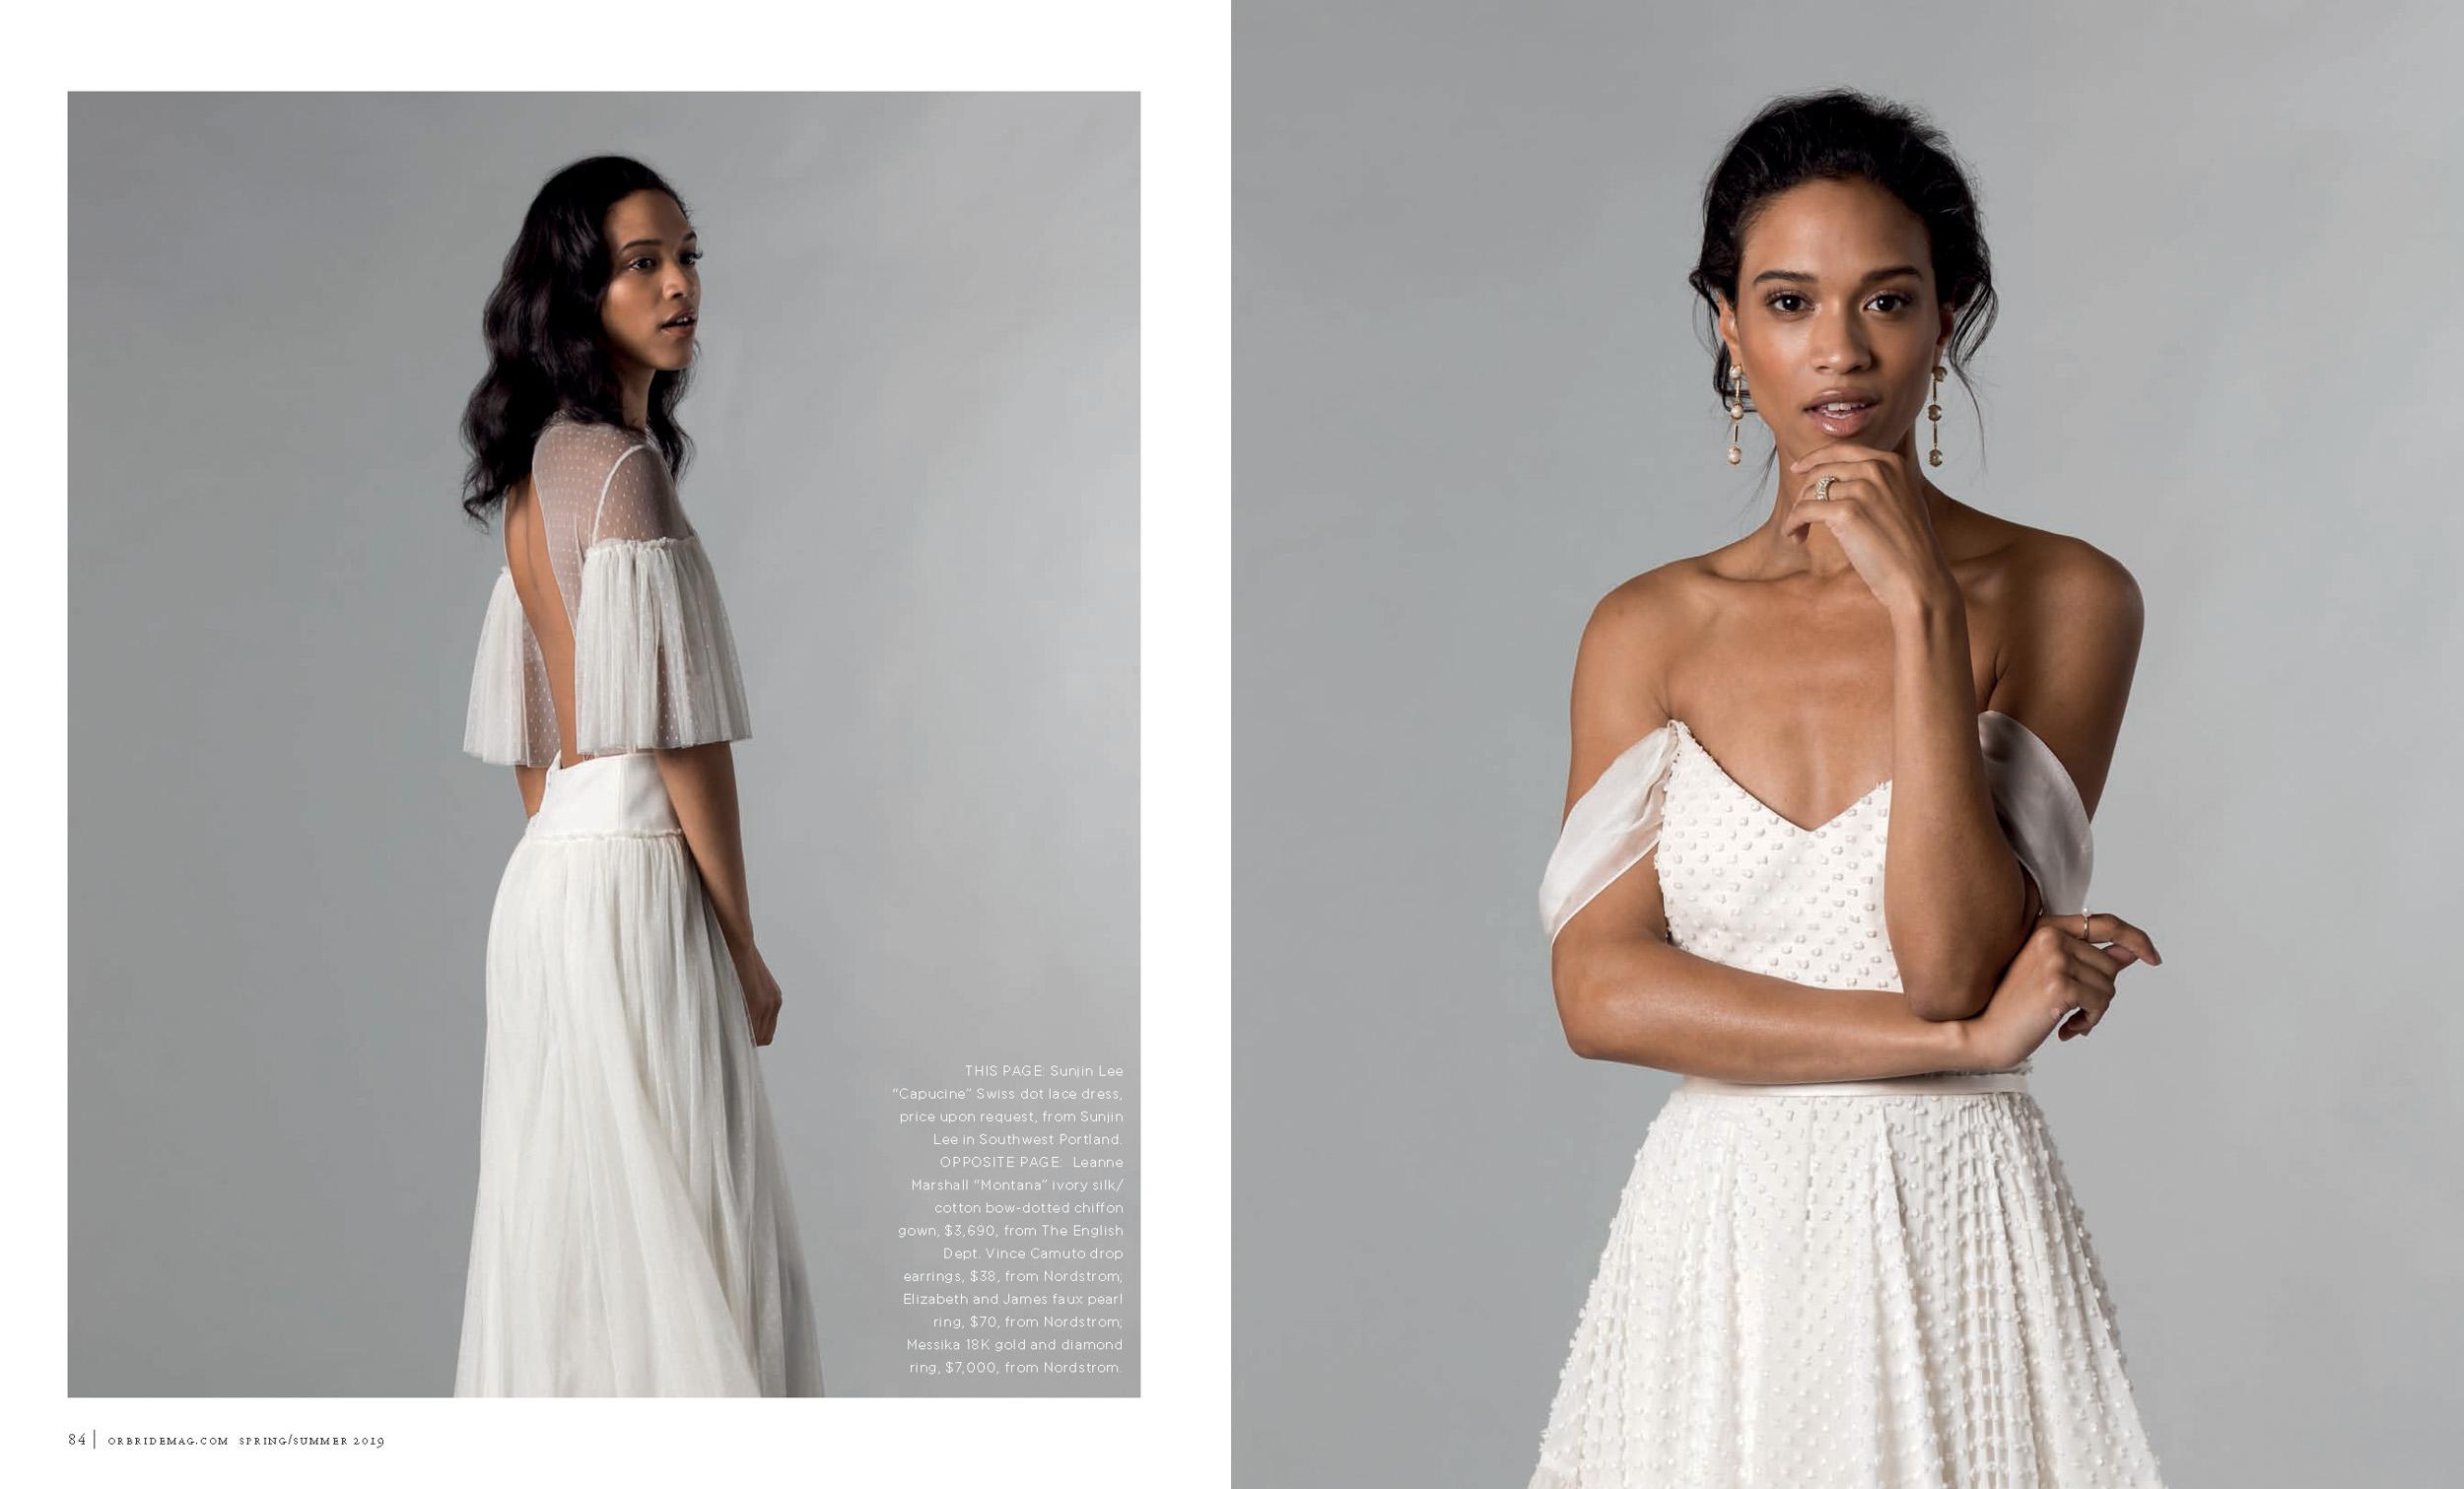 fashion-photography-OBR_SS19_Fashion2A_Page_2.jpg